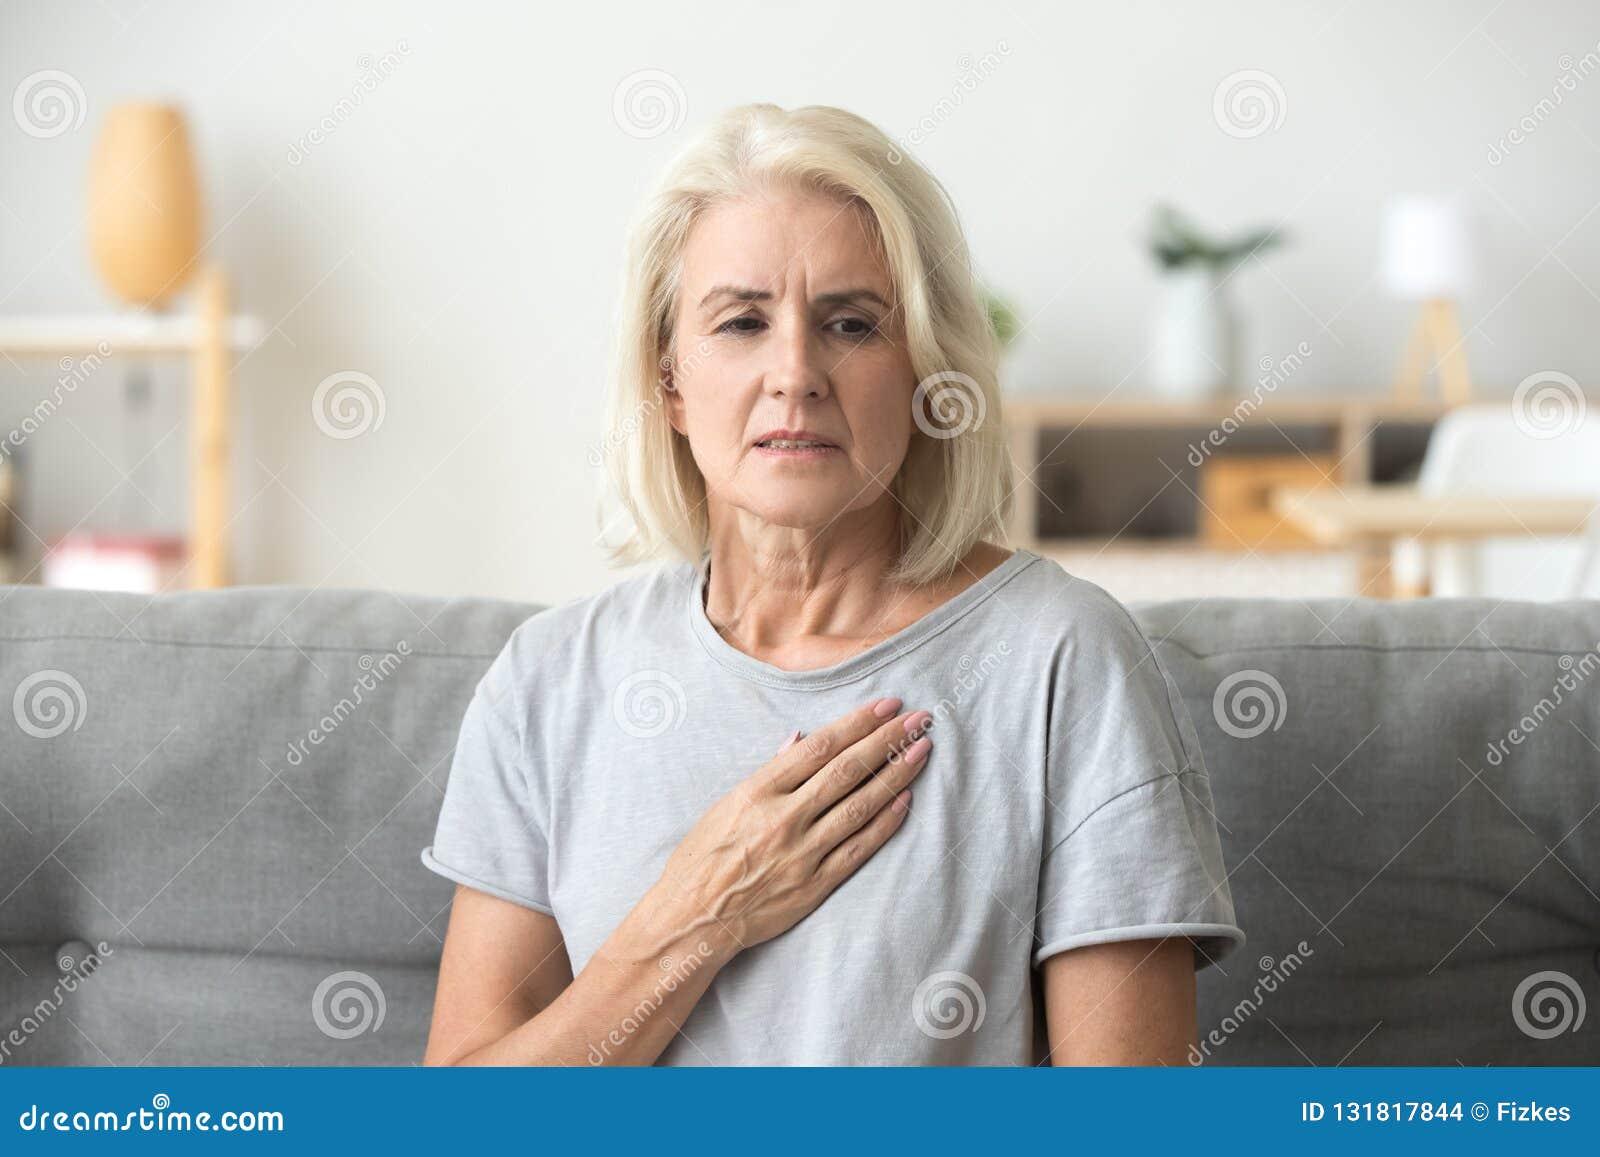 Mature Older Woman.com